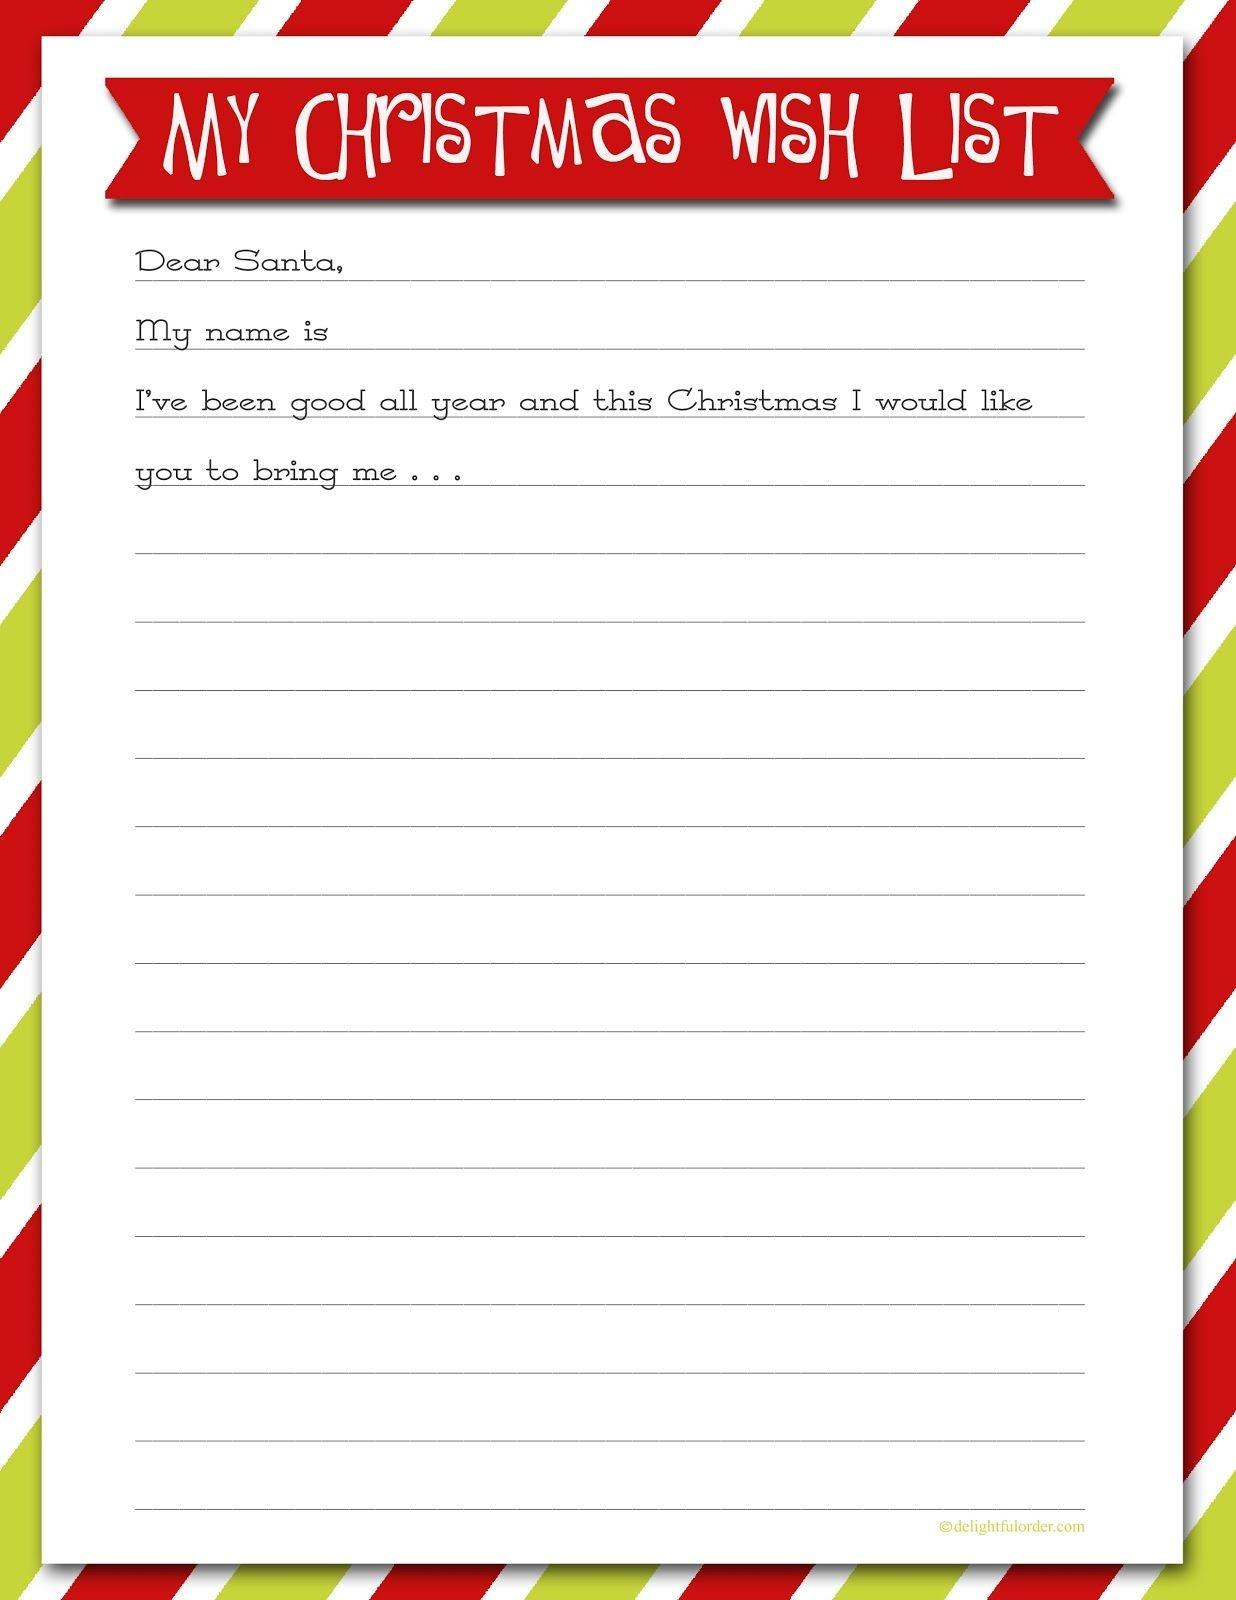 Delightful Order: Christmas Wish List - Free Printable   Delightful - Free Printable Christmas Wish List